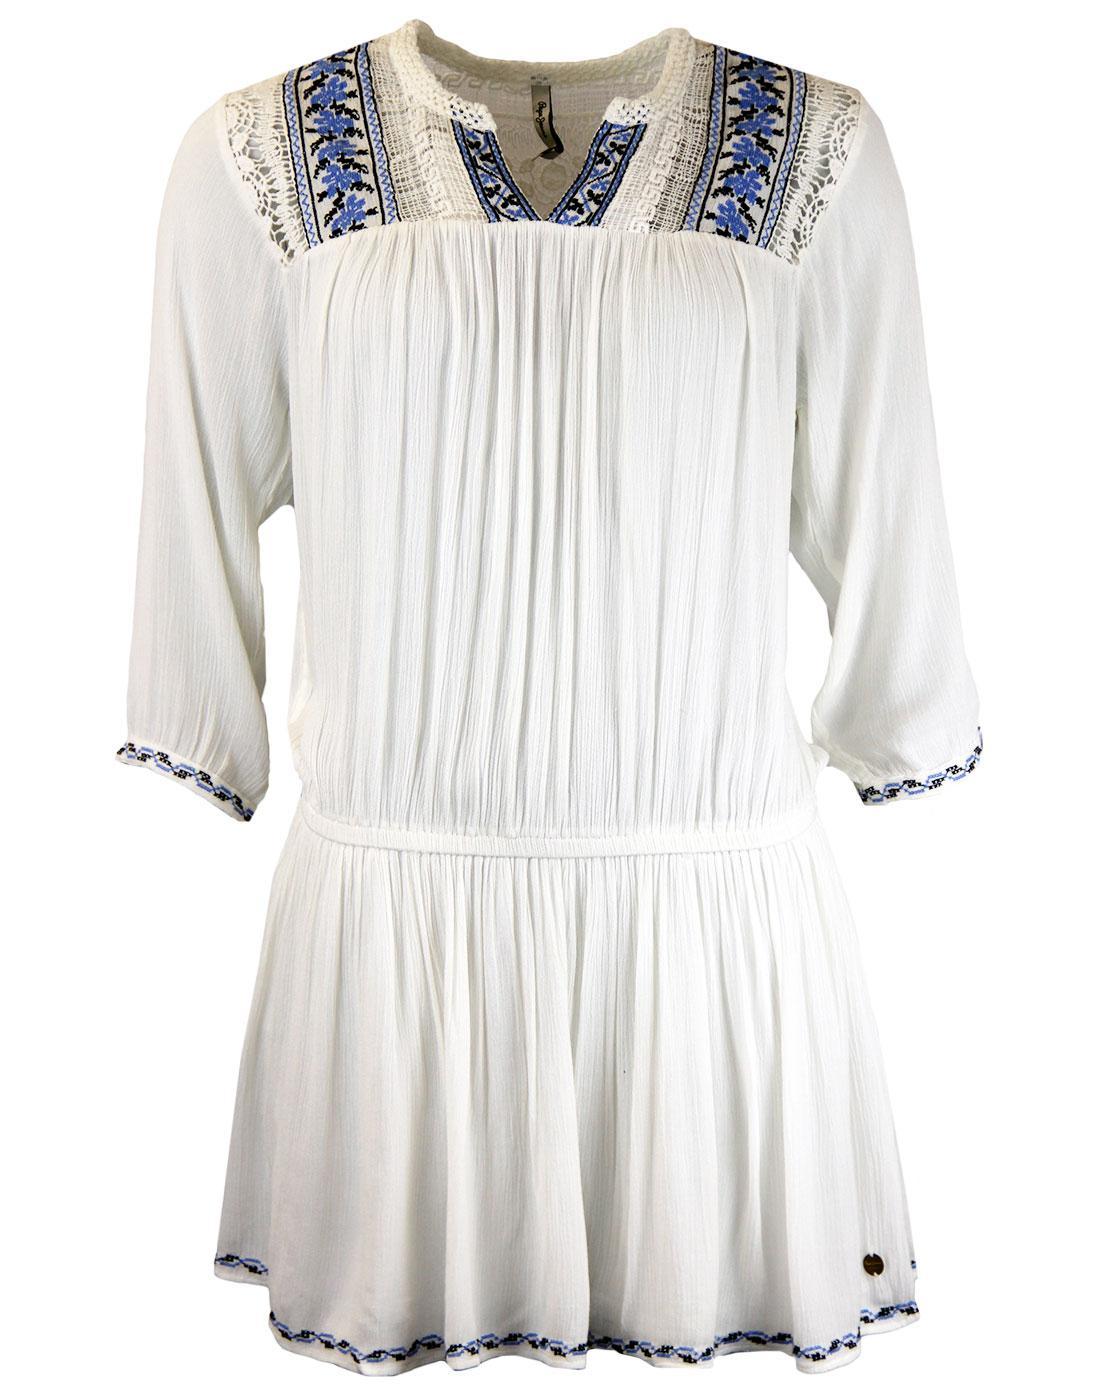 ALADIS PEPE Retro Embroidered Kaftan Tunic Dress